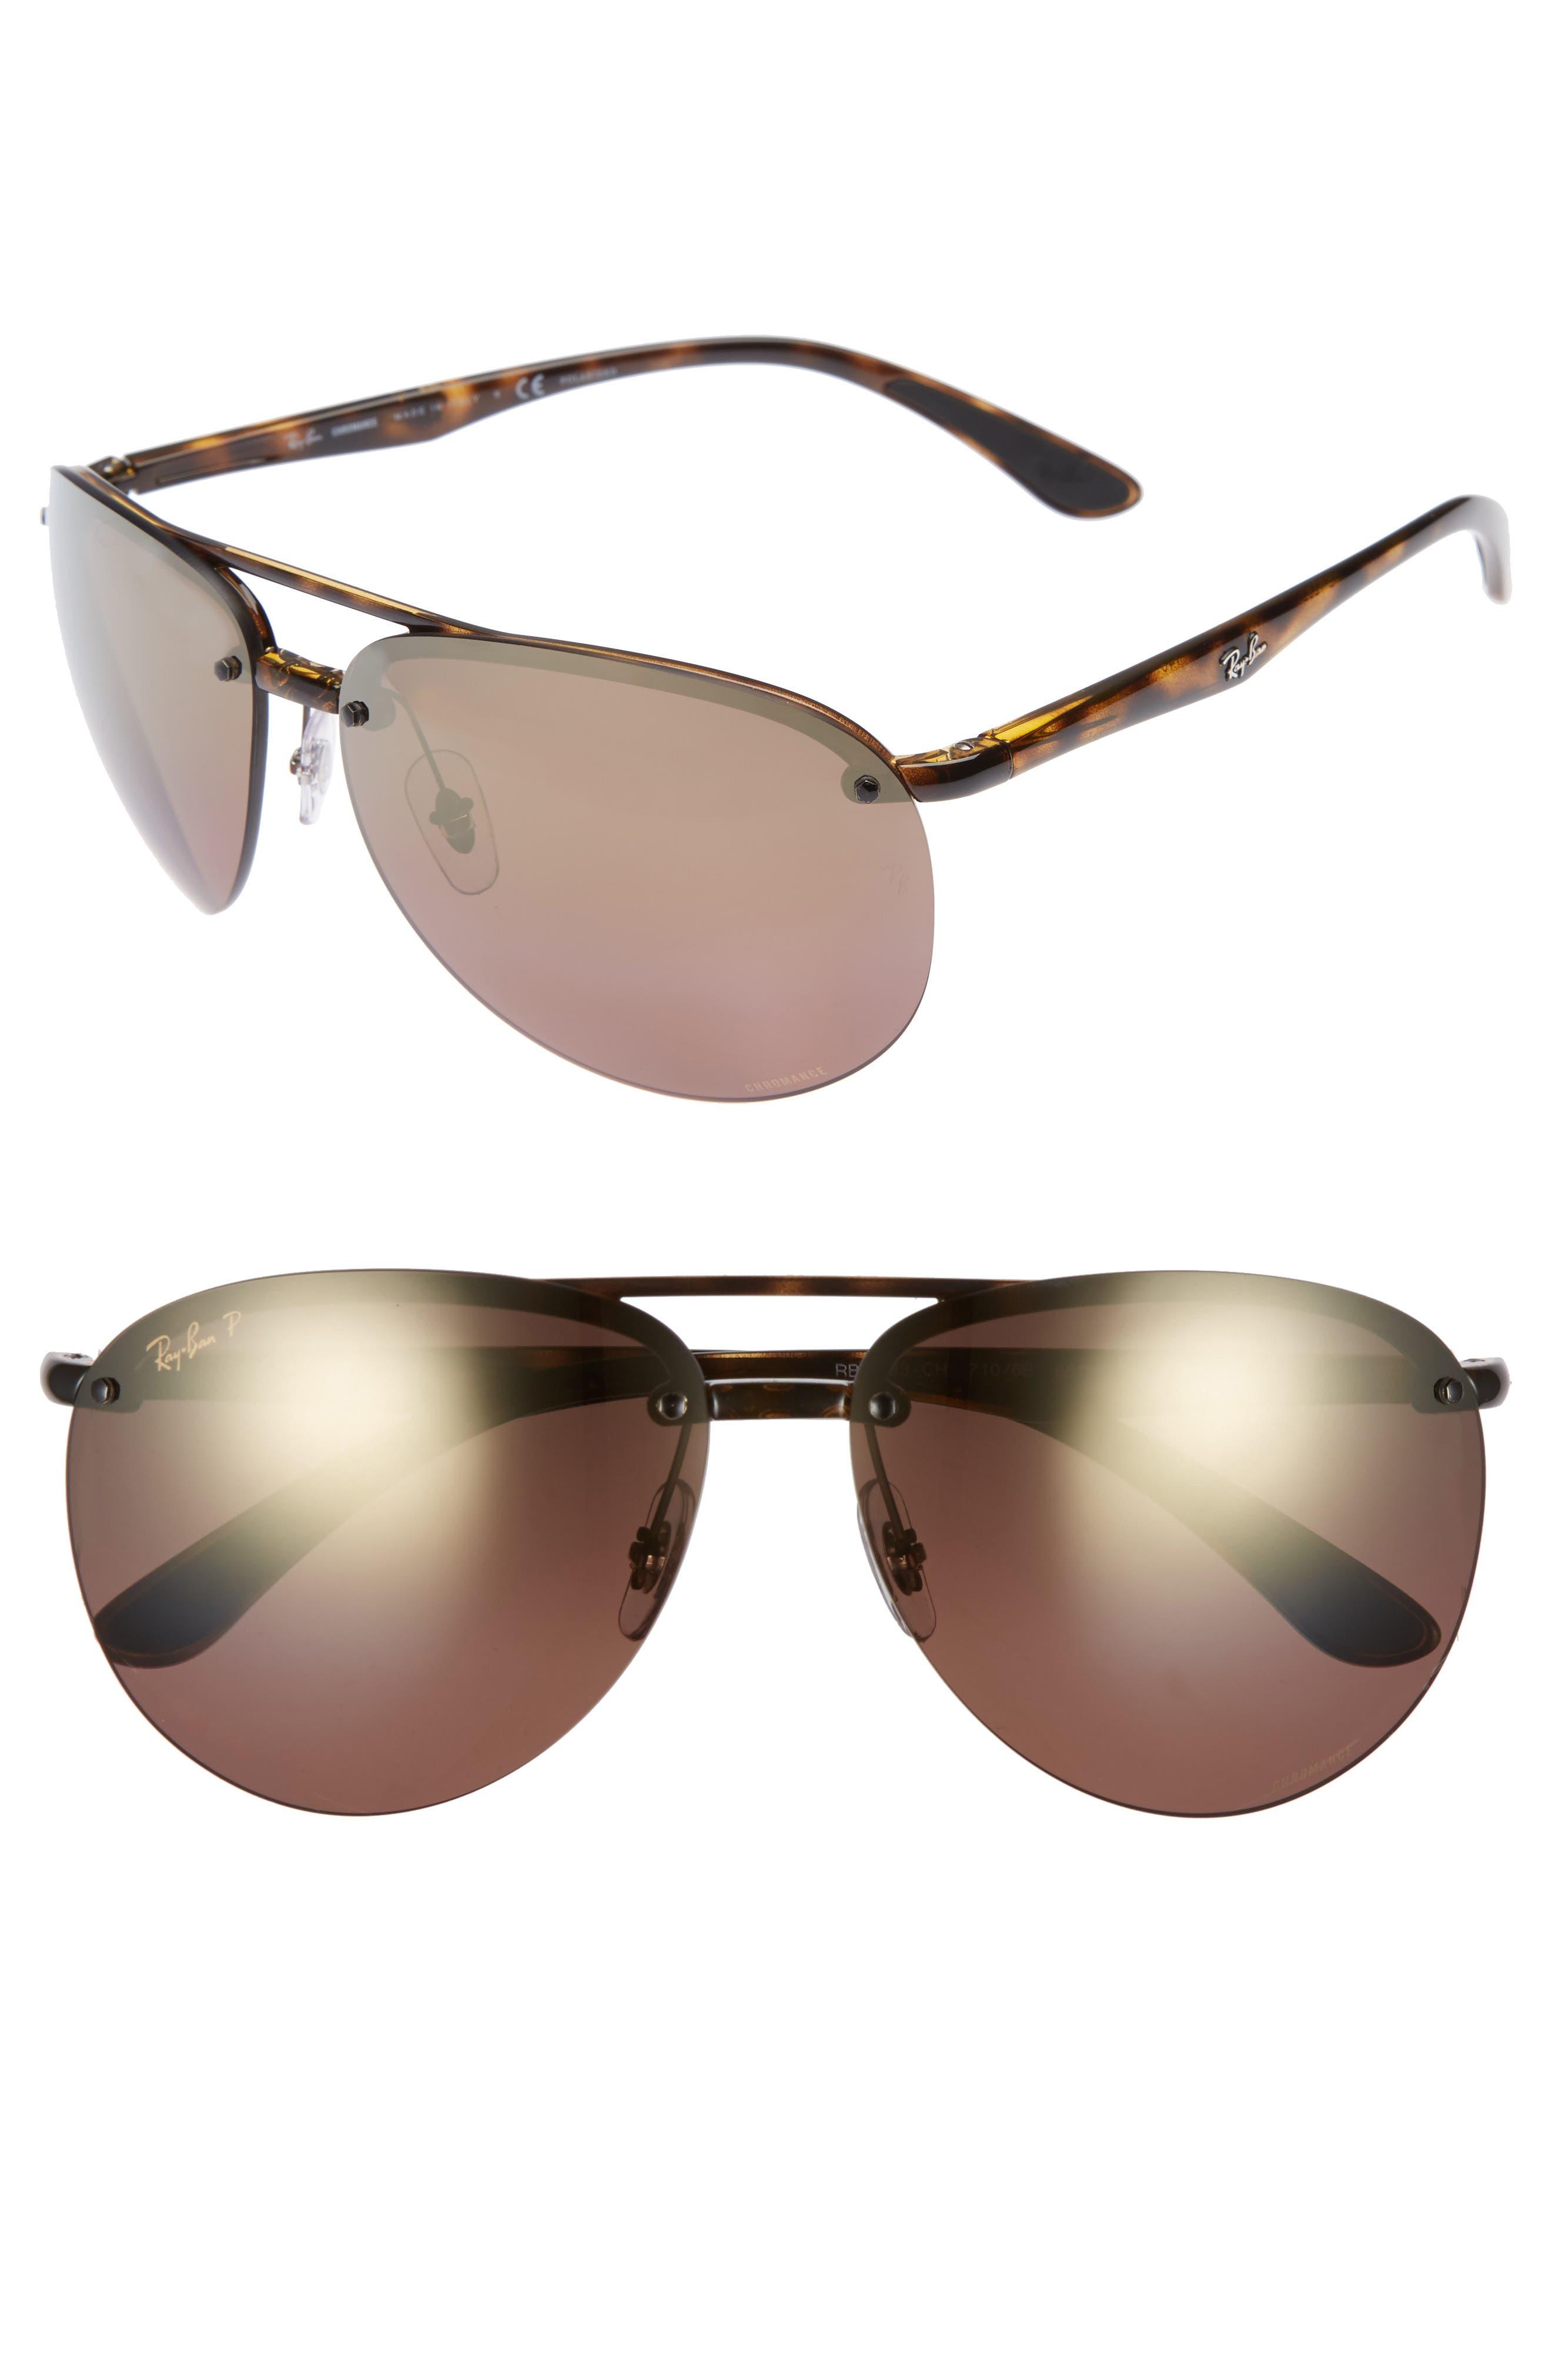 65mm Gradient Aviator Sunglasses,                         Main,                         color, Havana